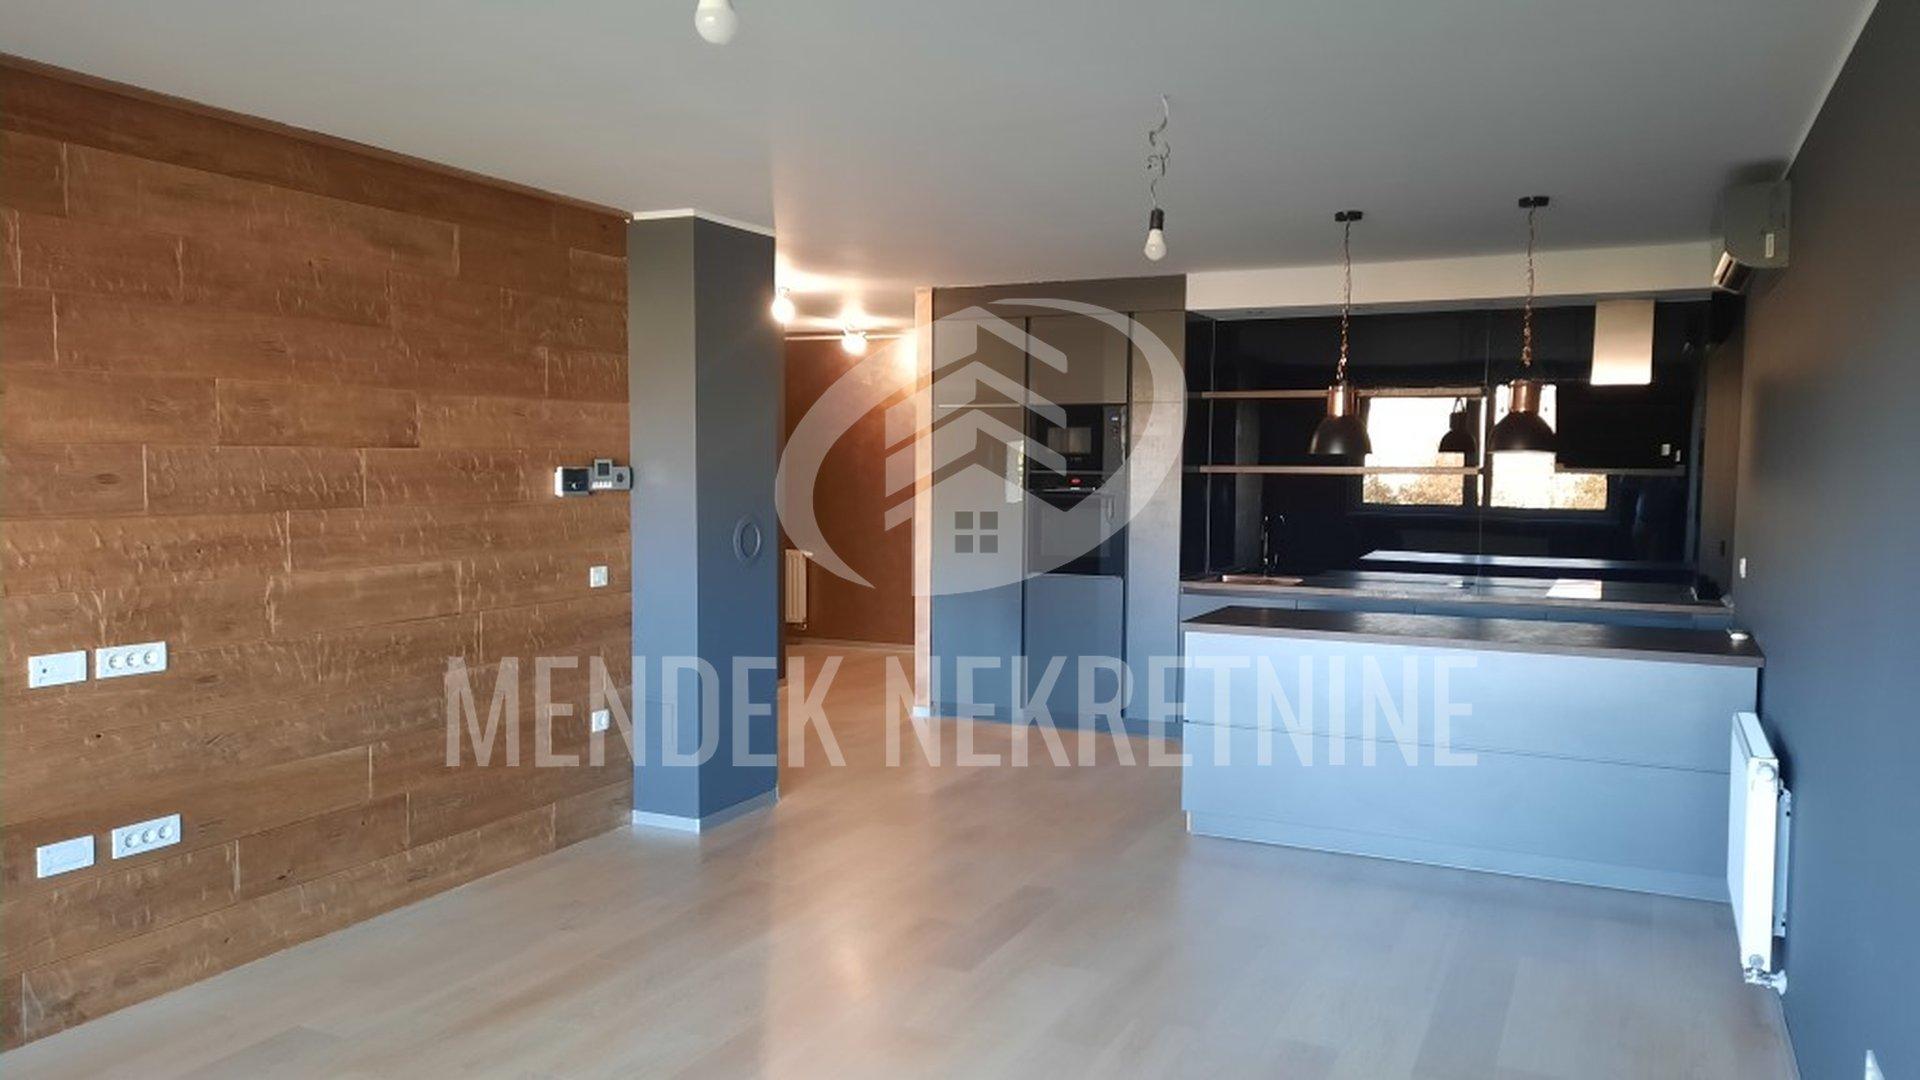 Stanovanje, 74 m2, Najem, Varaždin - Centar